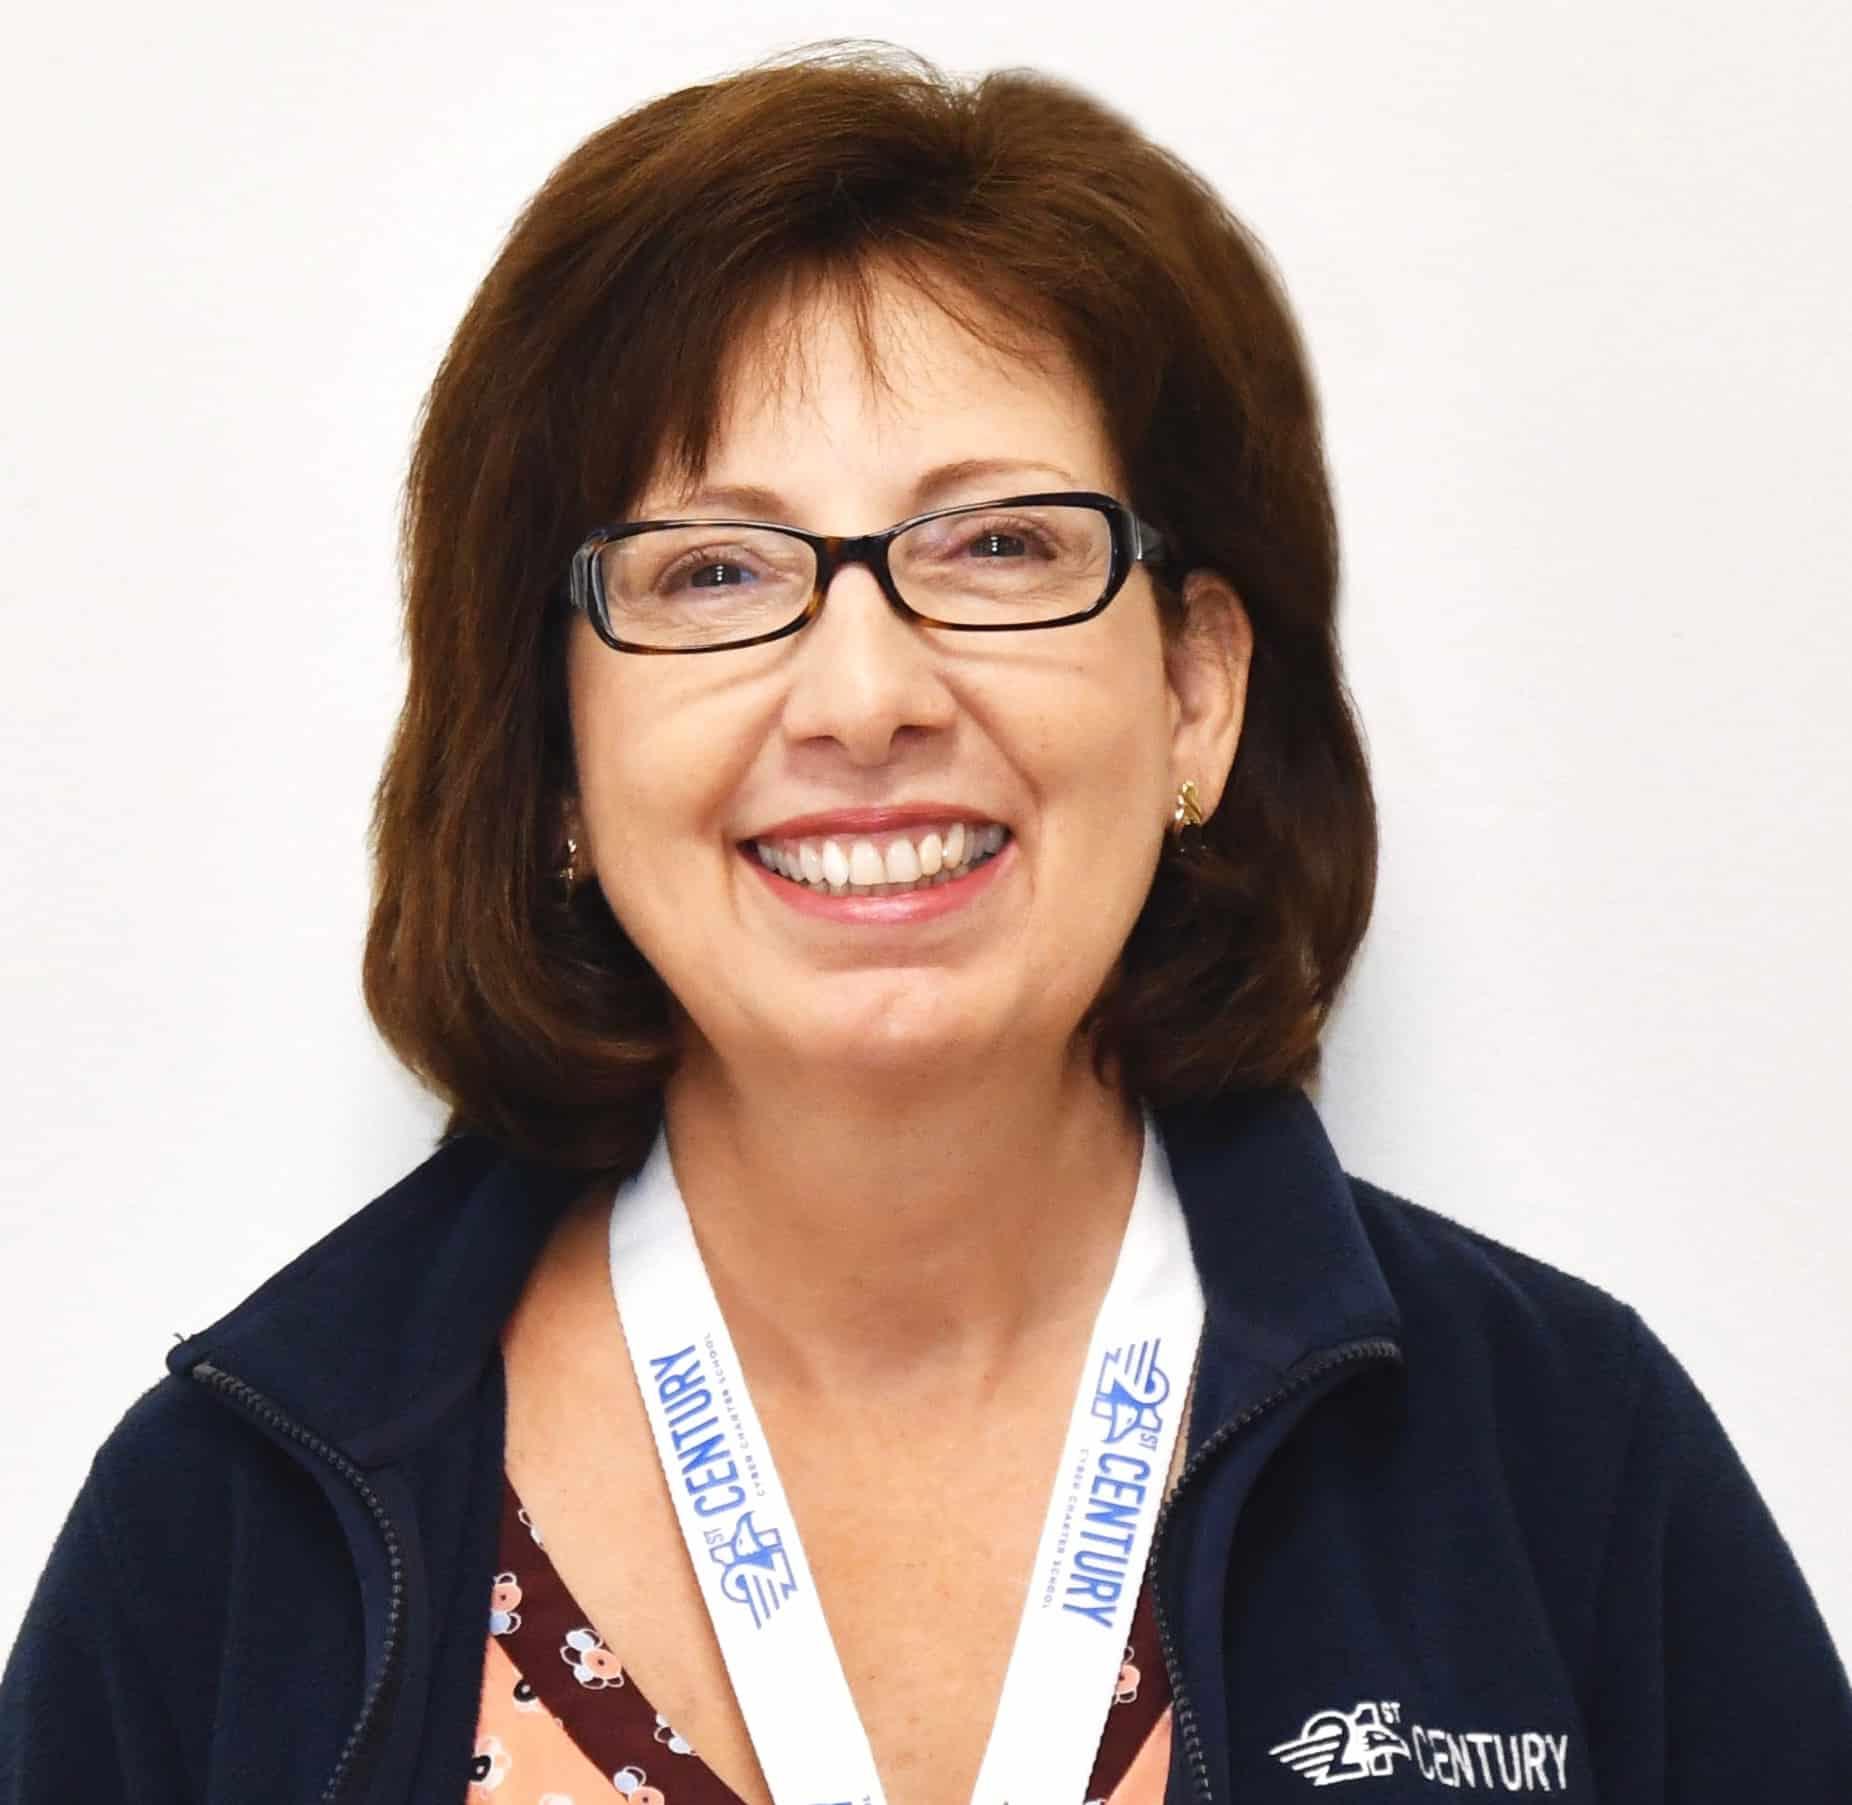 Veronica Danahy